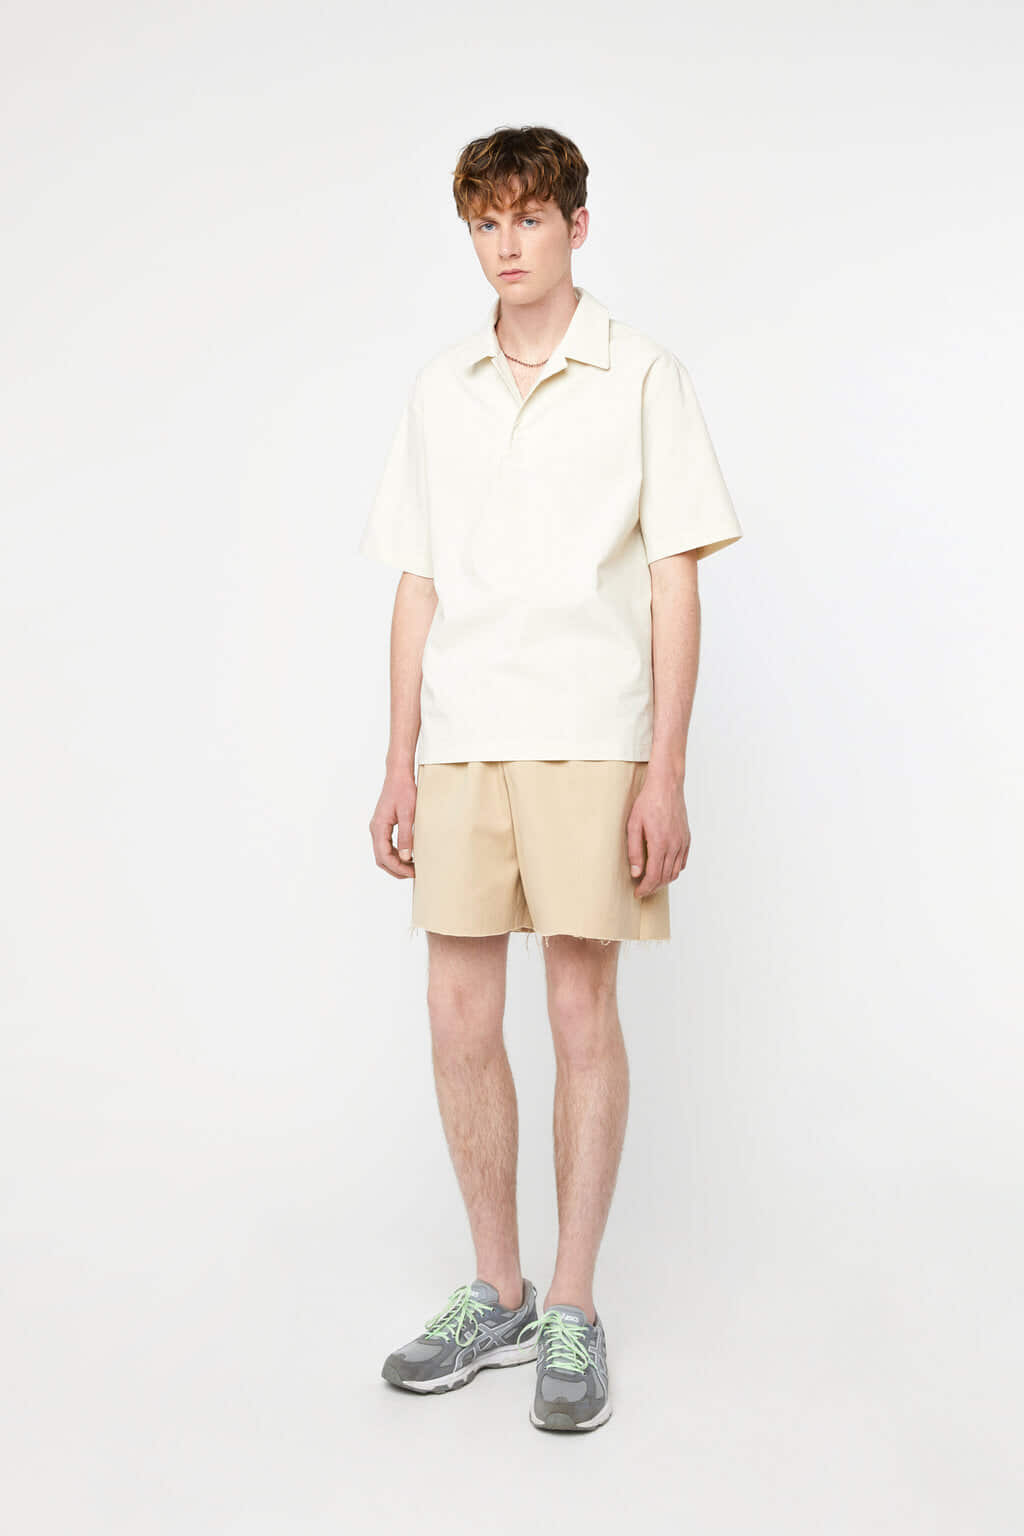 Shirt K003 Beige 2